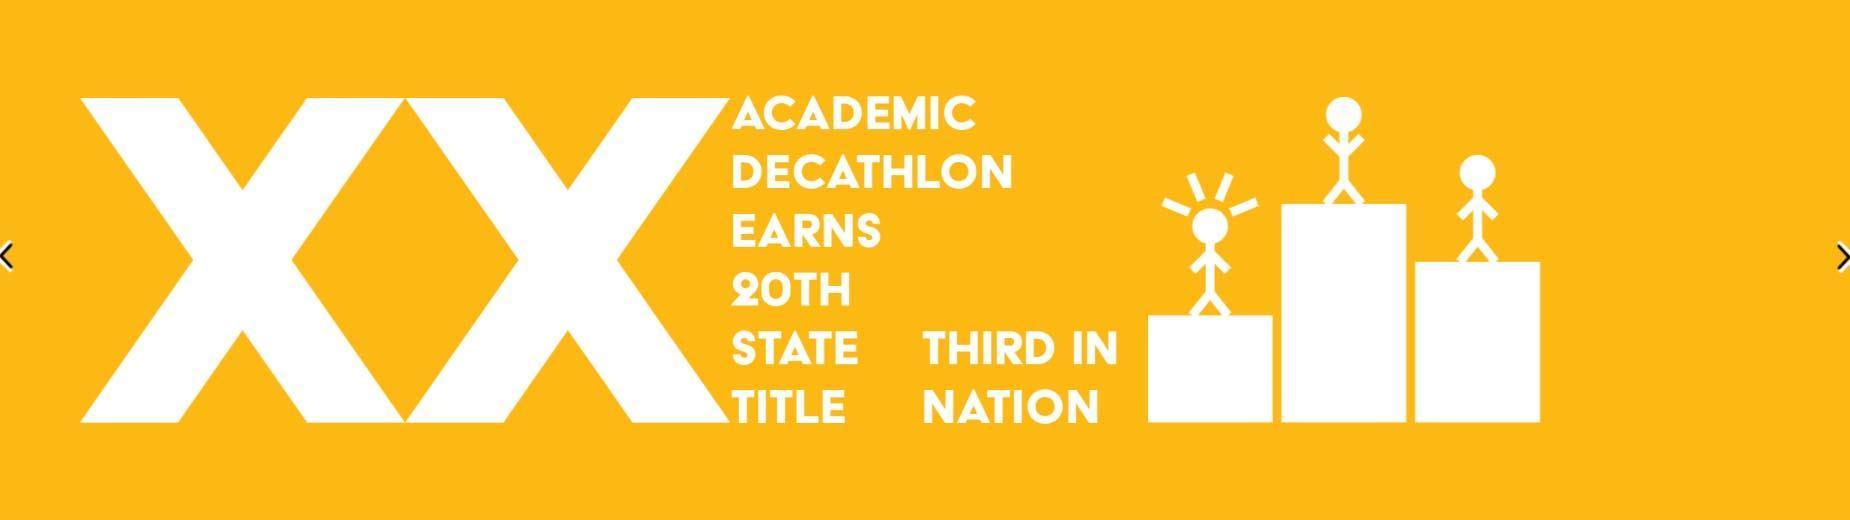 Academic Decathlon news article